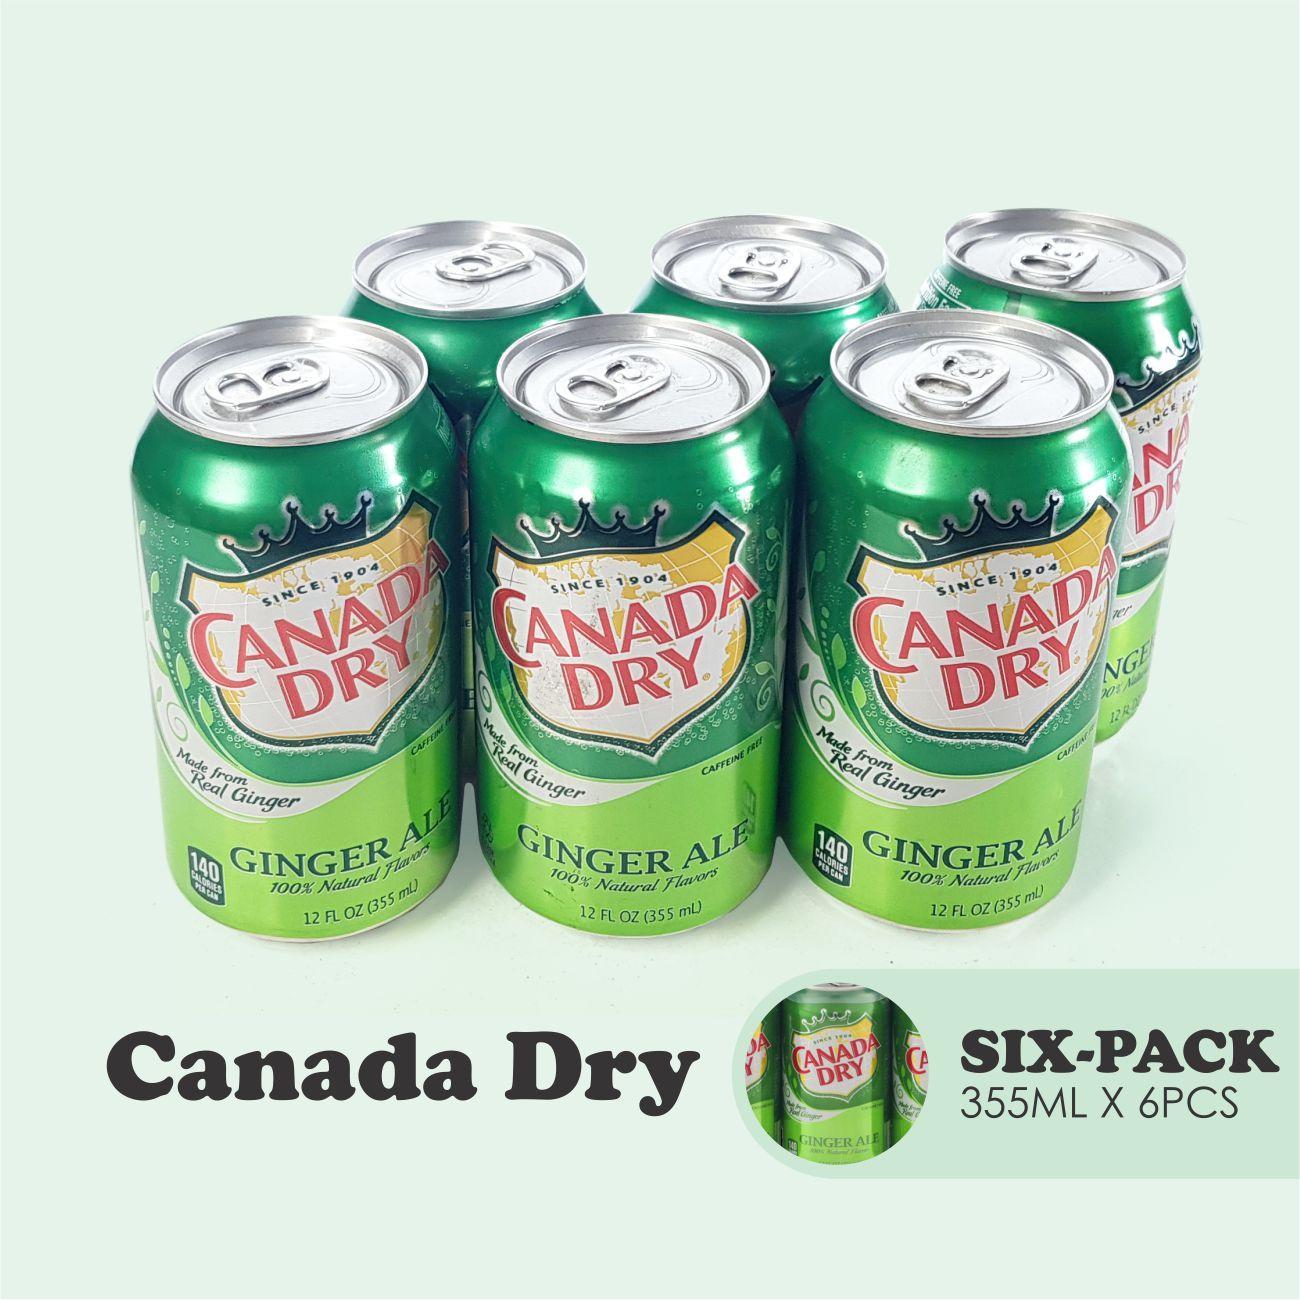 4acb51c2664d Softdrinks brands - Colas   Fizzy Drinks on sale